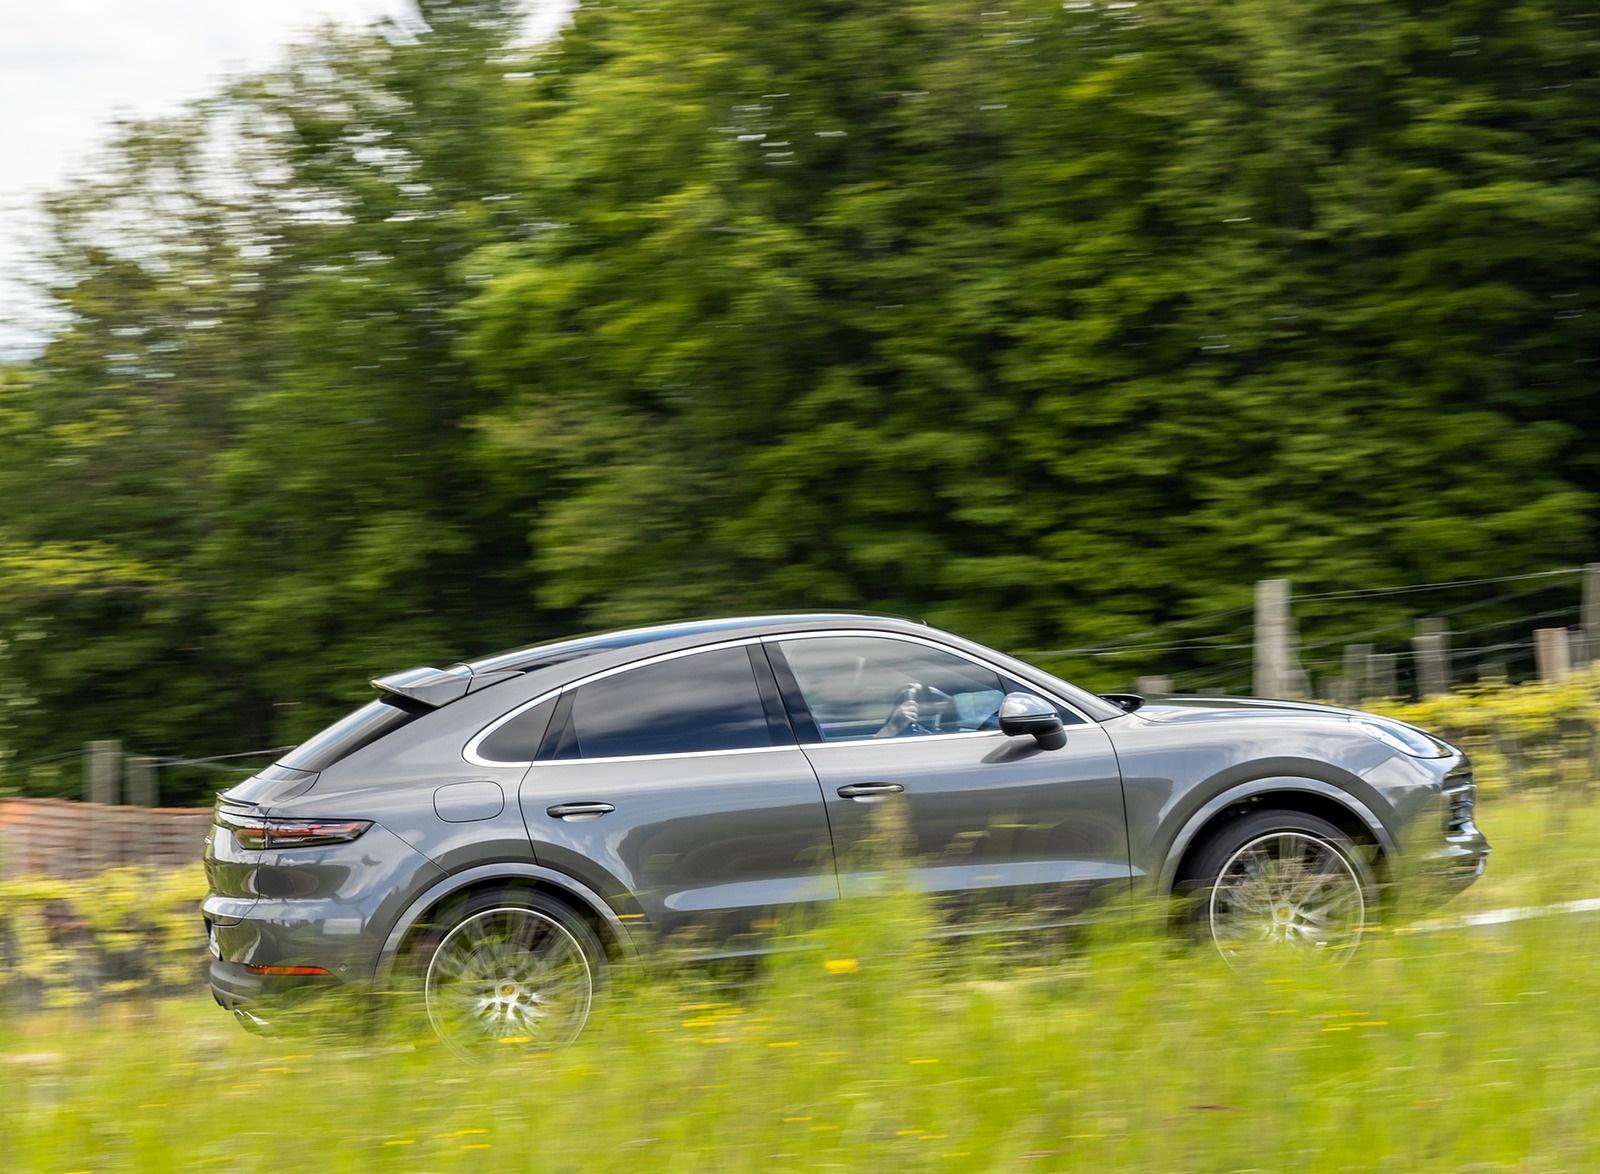 2020 Porsche Cayenne S Coupé (Color: Quarzite Grey Metallic) Side Wallpapers (11)